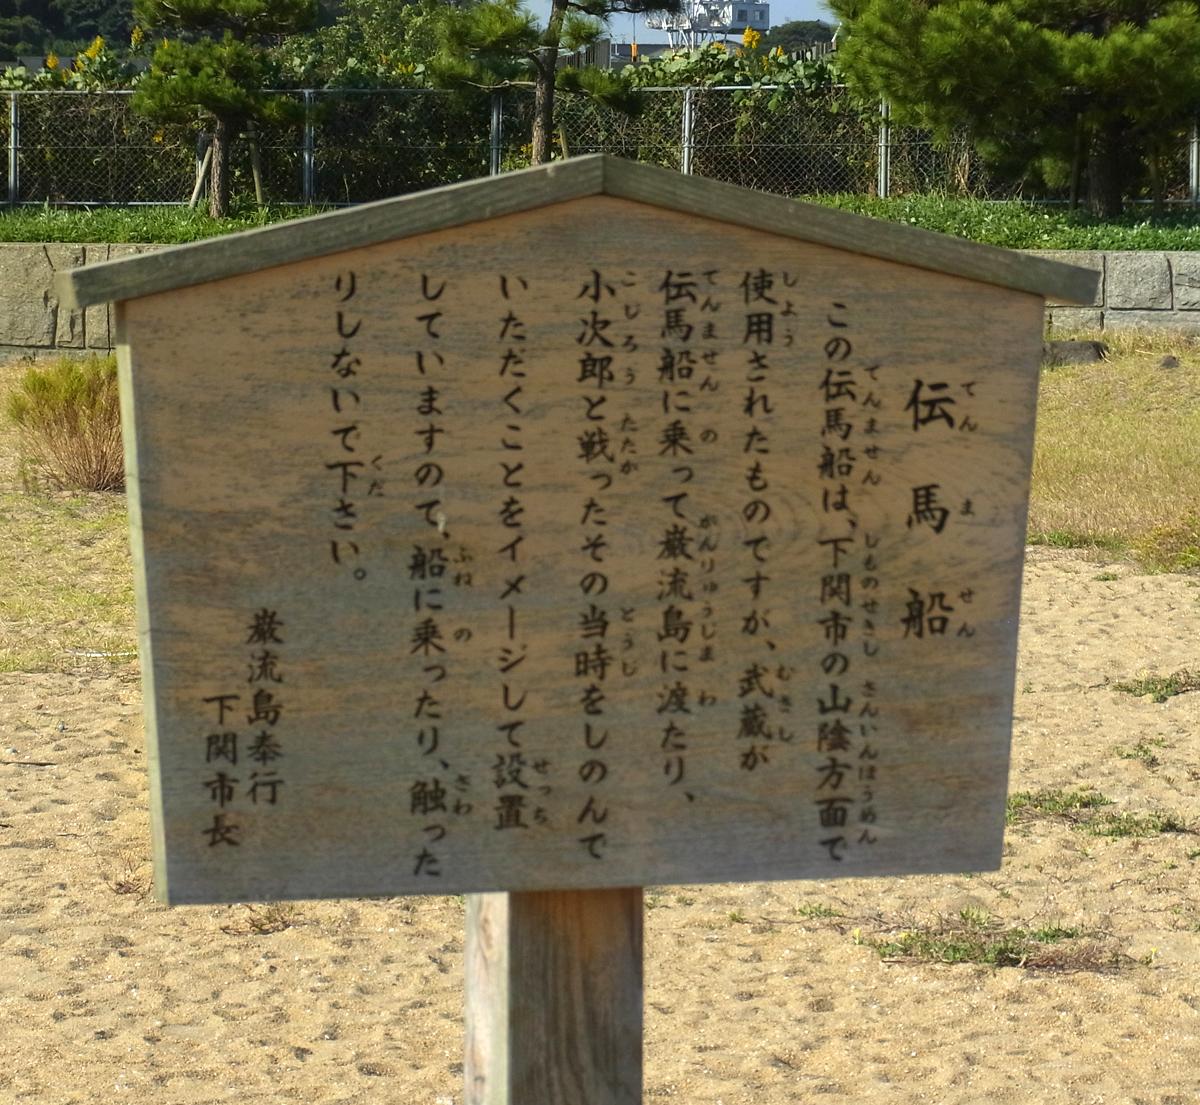 巌流島の人口海浜の伝間船